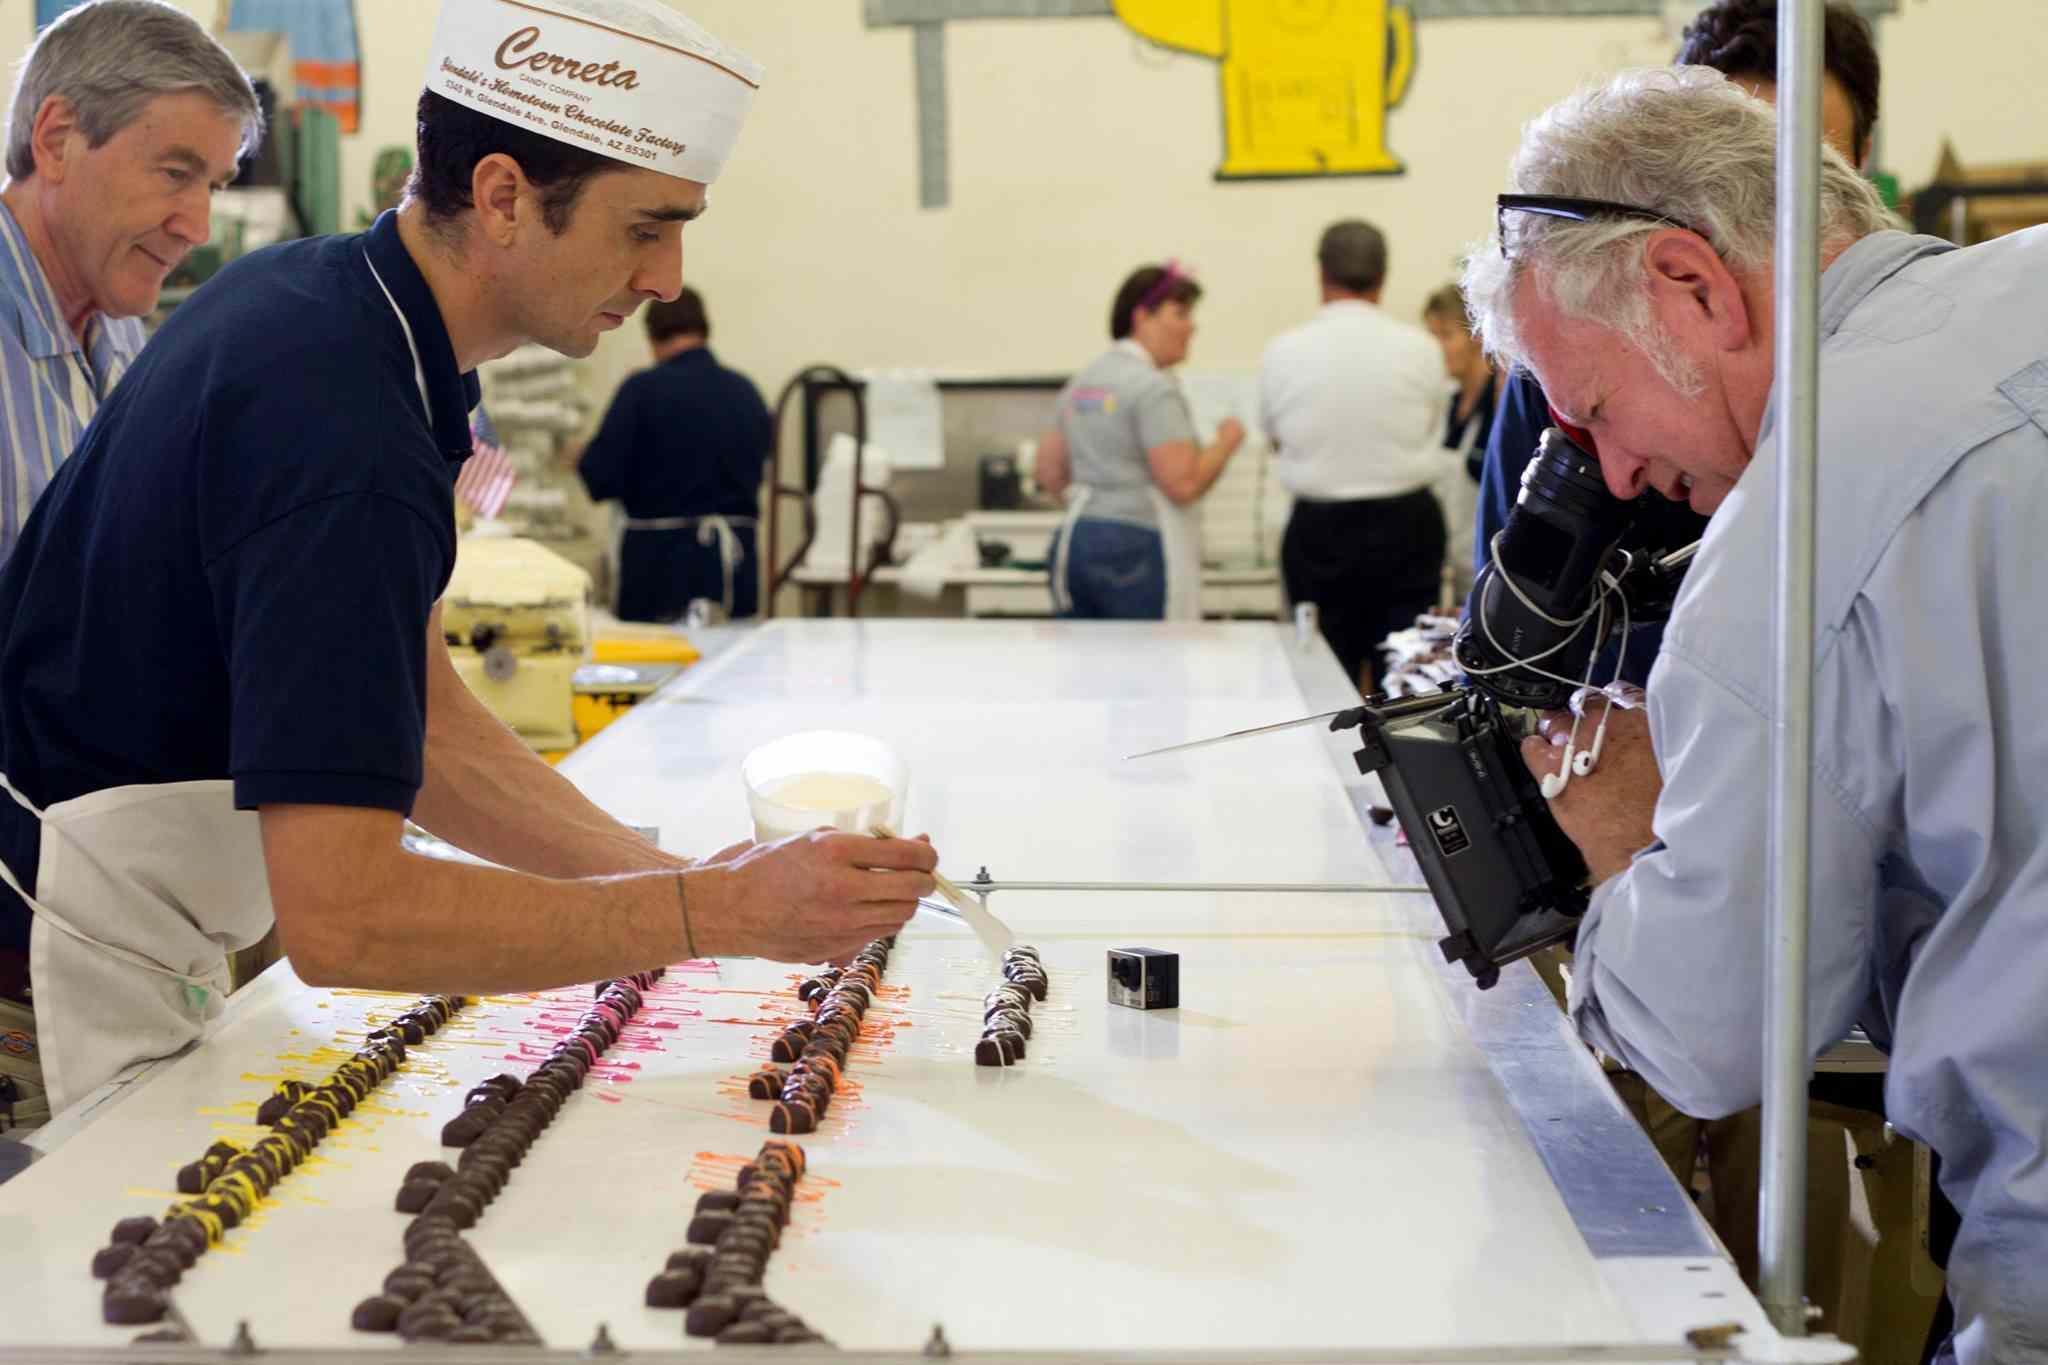 Making chocolates at the Cerreta Candy Company